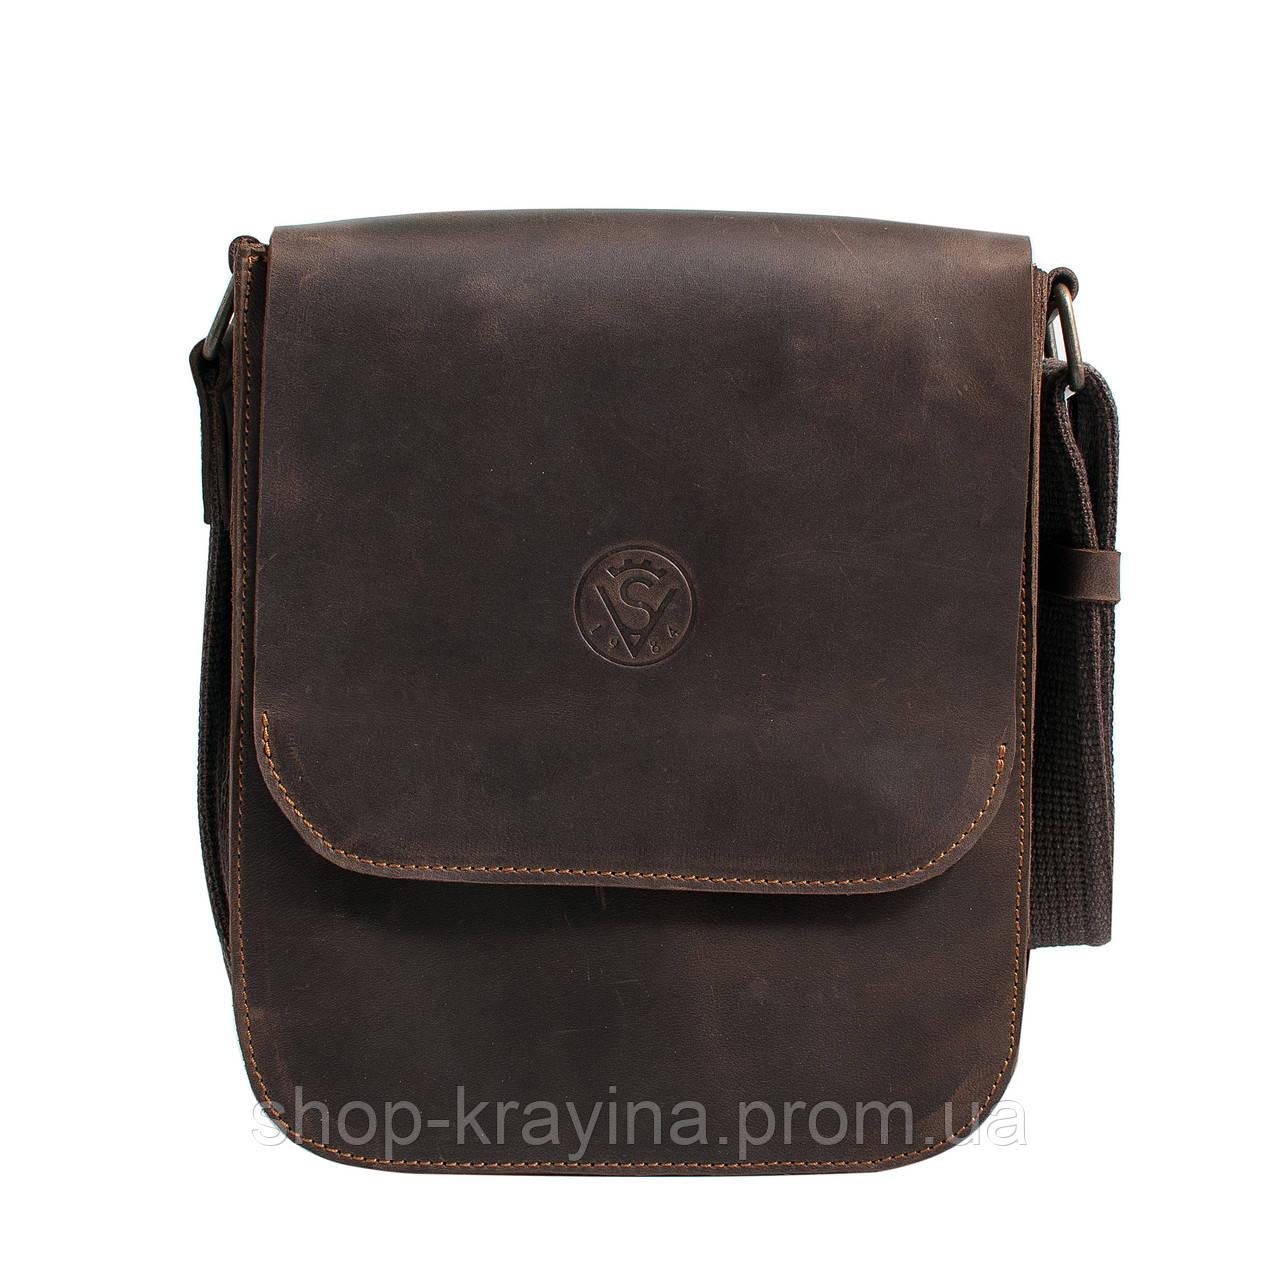 2a63a9fff464 Кожаная мужская сумка VS214 Crazy horse brown 20х23х5.5 см - Интернет  магазин сумок,